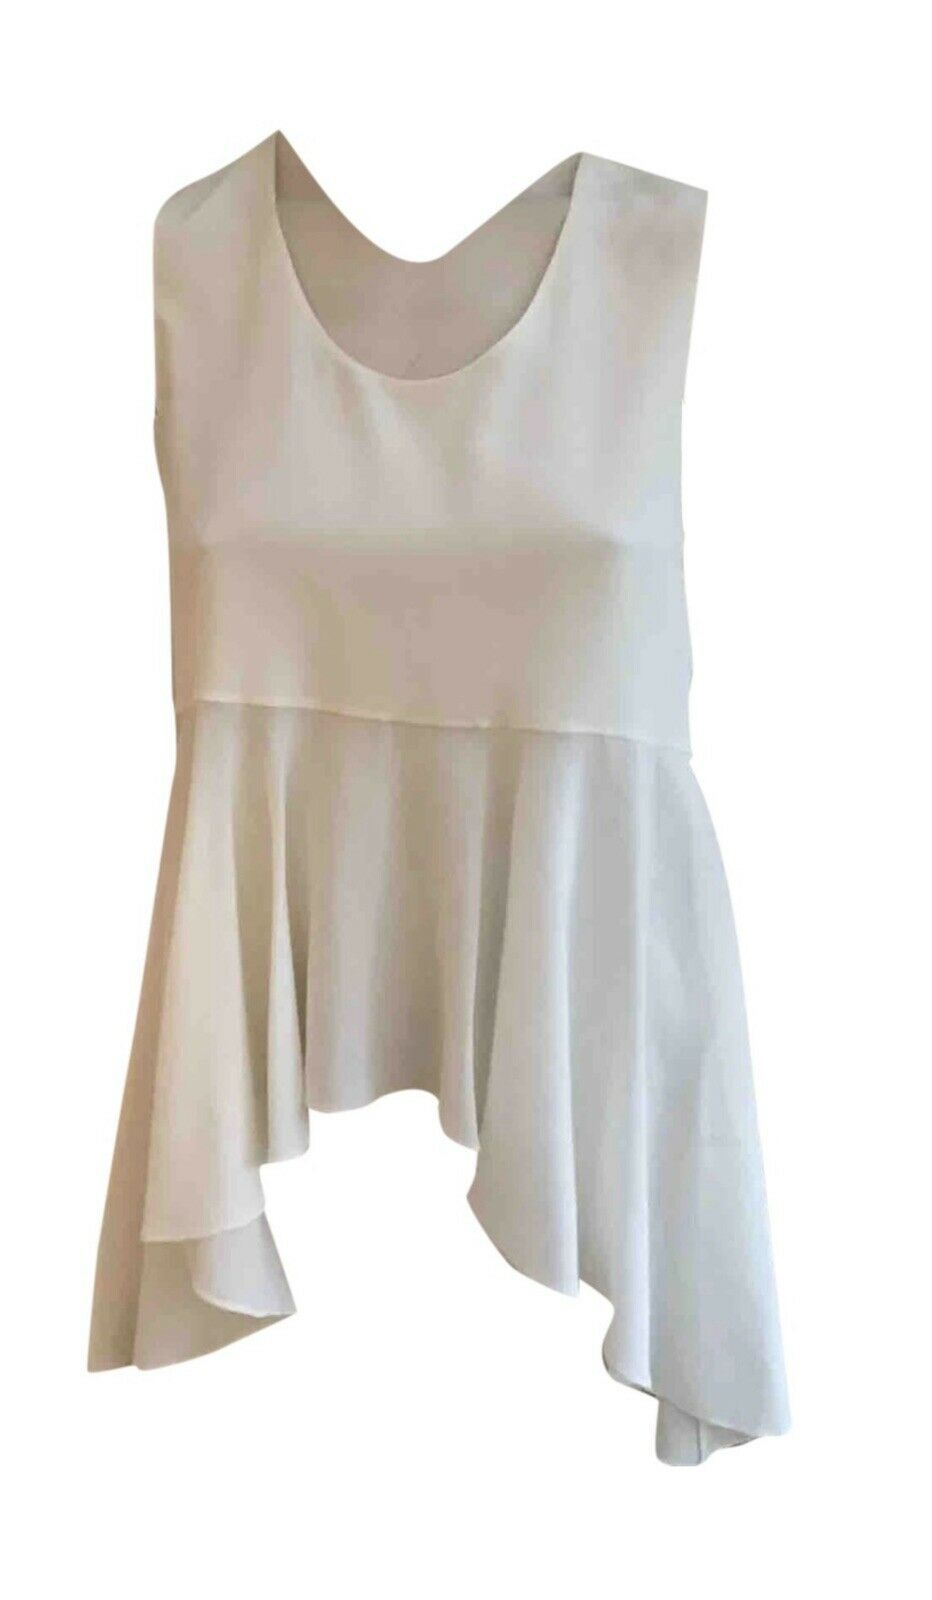 ,628 chloe chloe 2015 fuyarde péplum top blouse f 34 uk 4 us 0 xxs